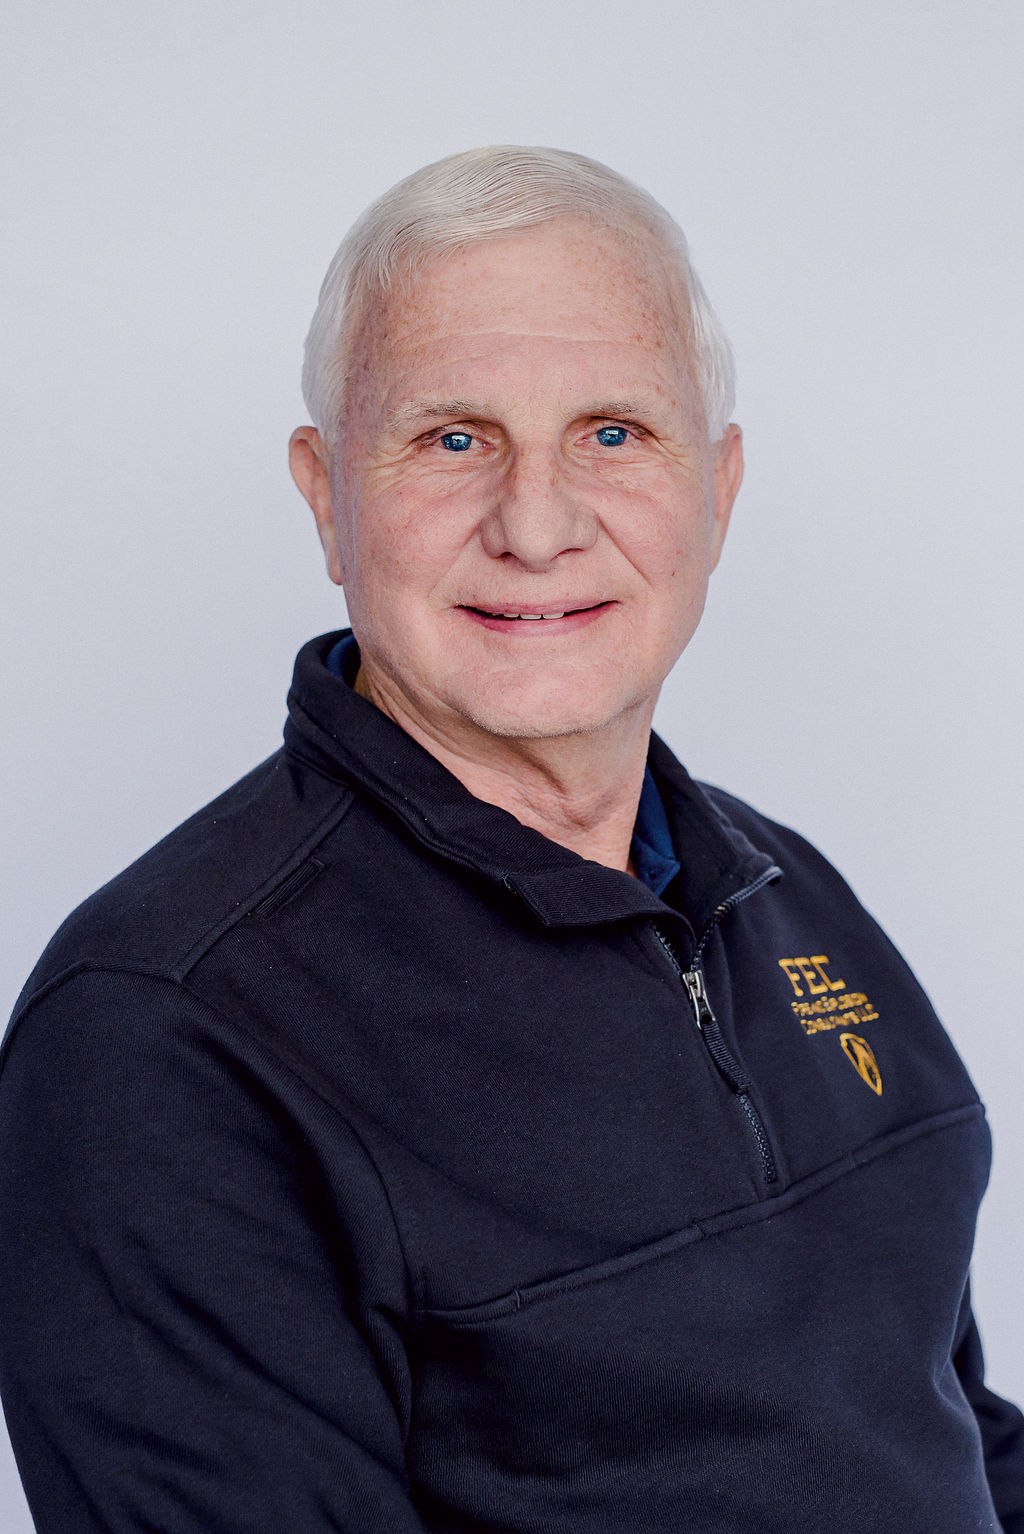 Bob Marihugh